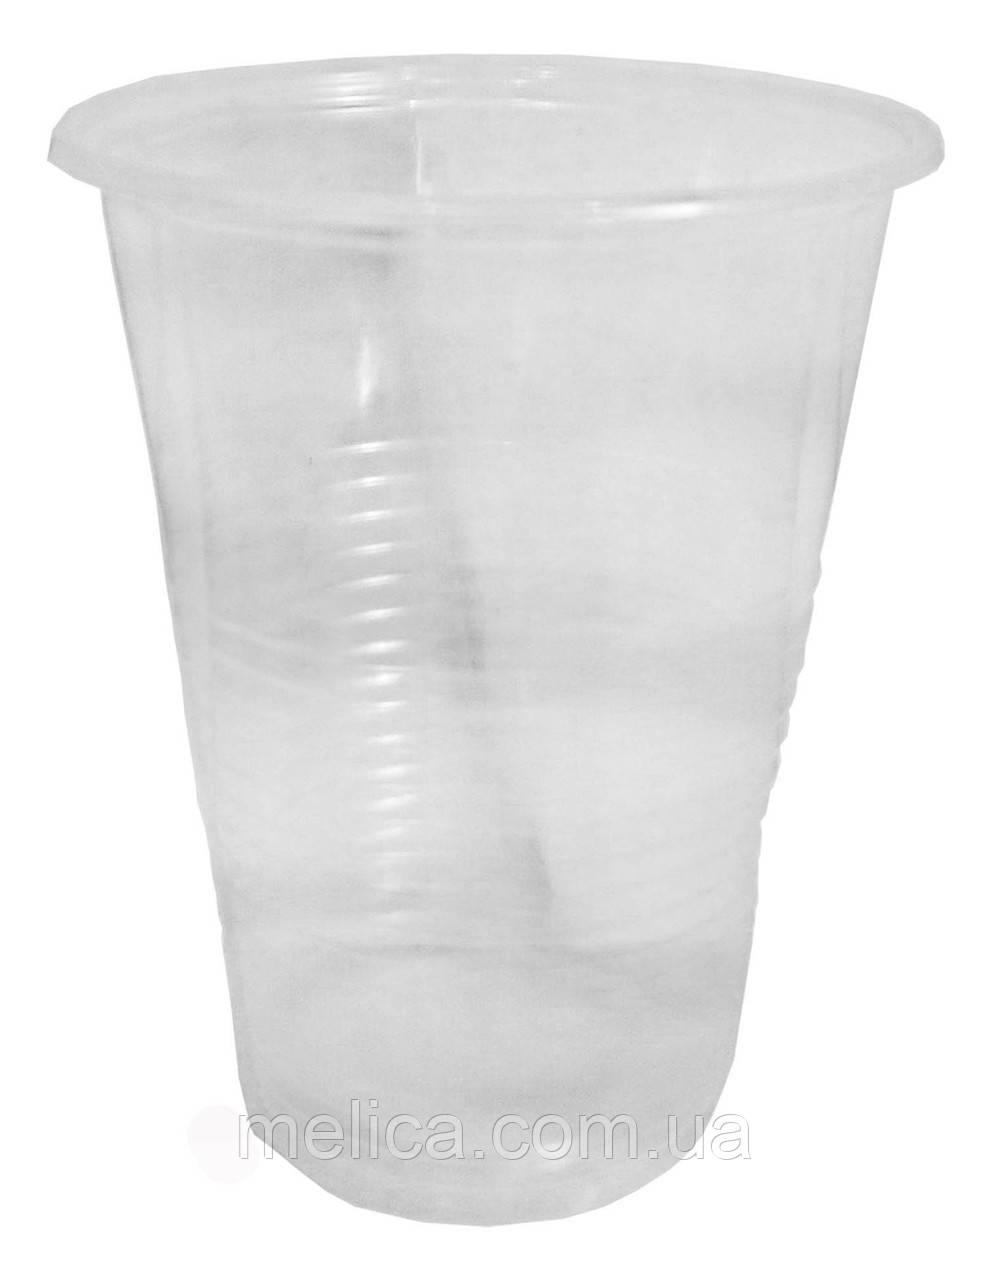 Стаканы пластиковые одноразовые PGU 300 мл - 50 шт.